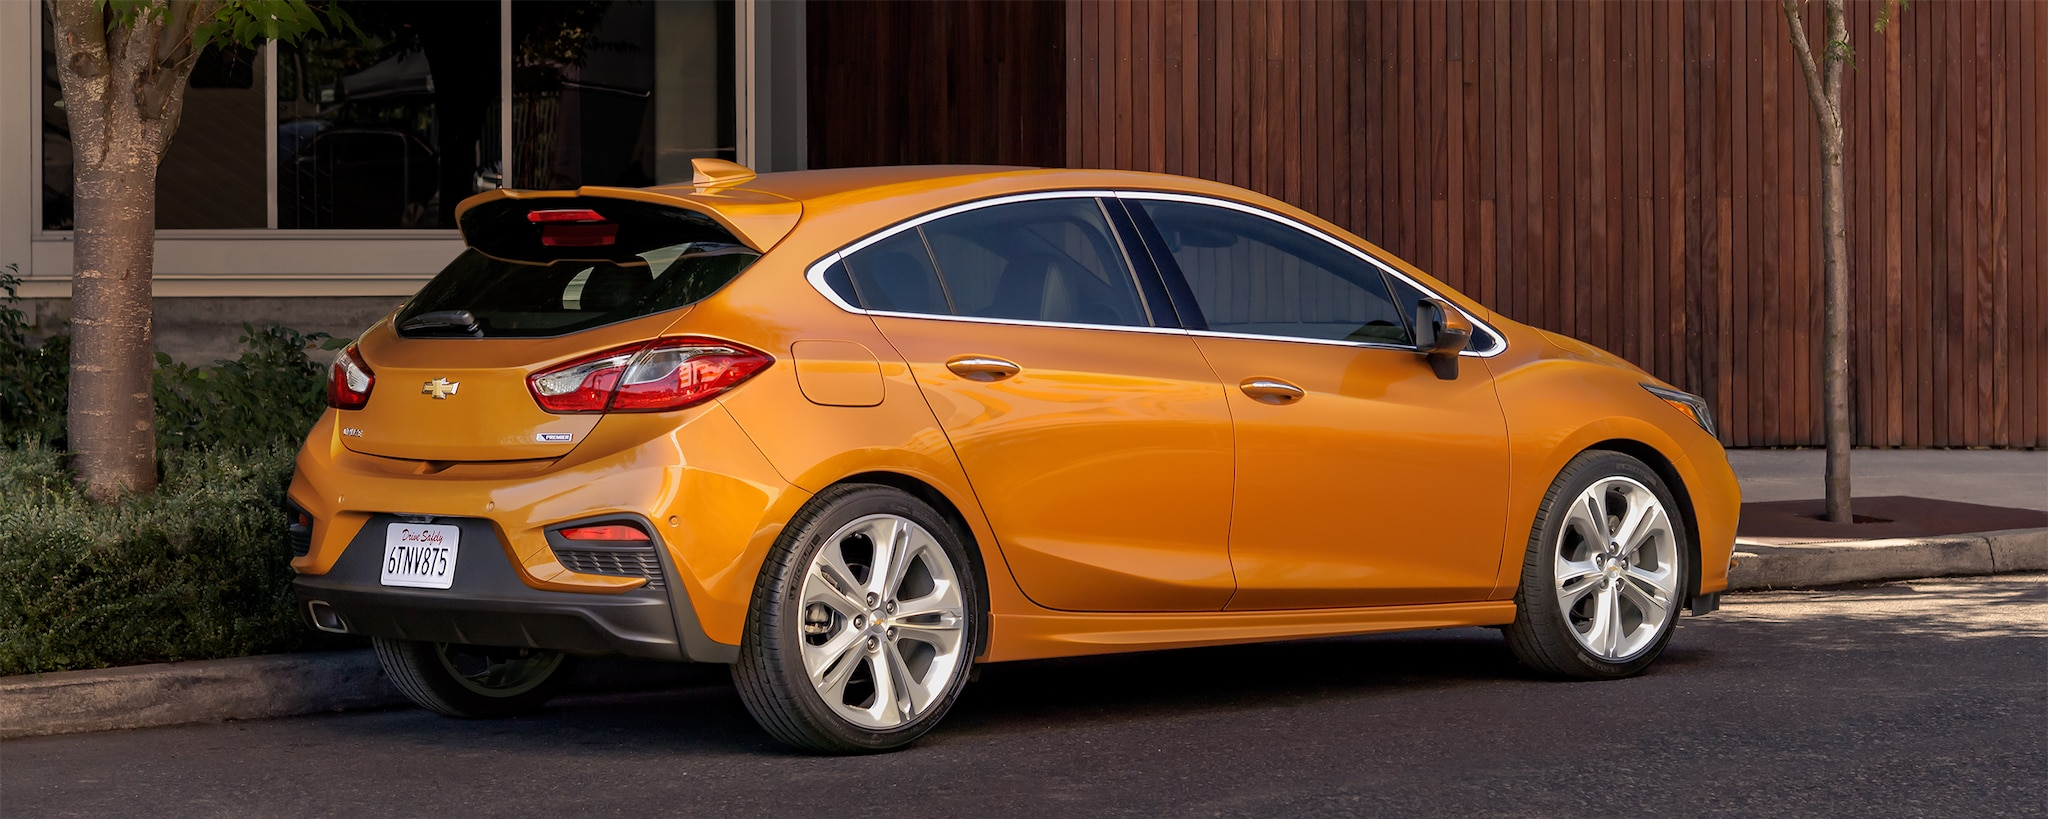 Economía de combustible de Chevrolet: Cruze Premier Hatch 2017